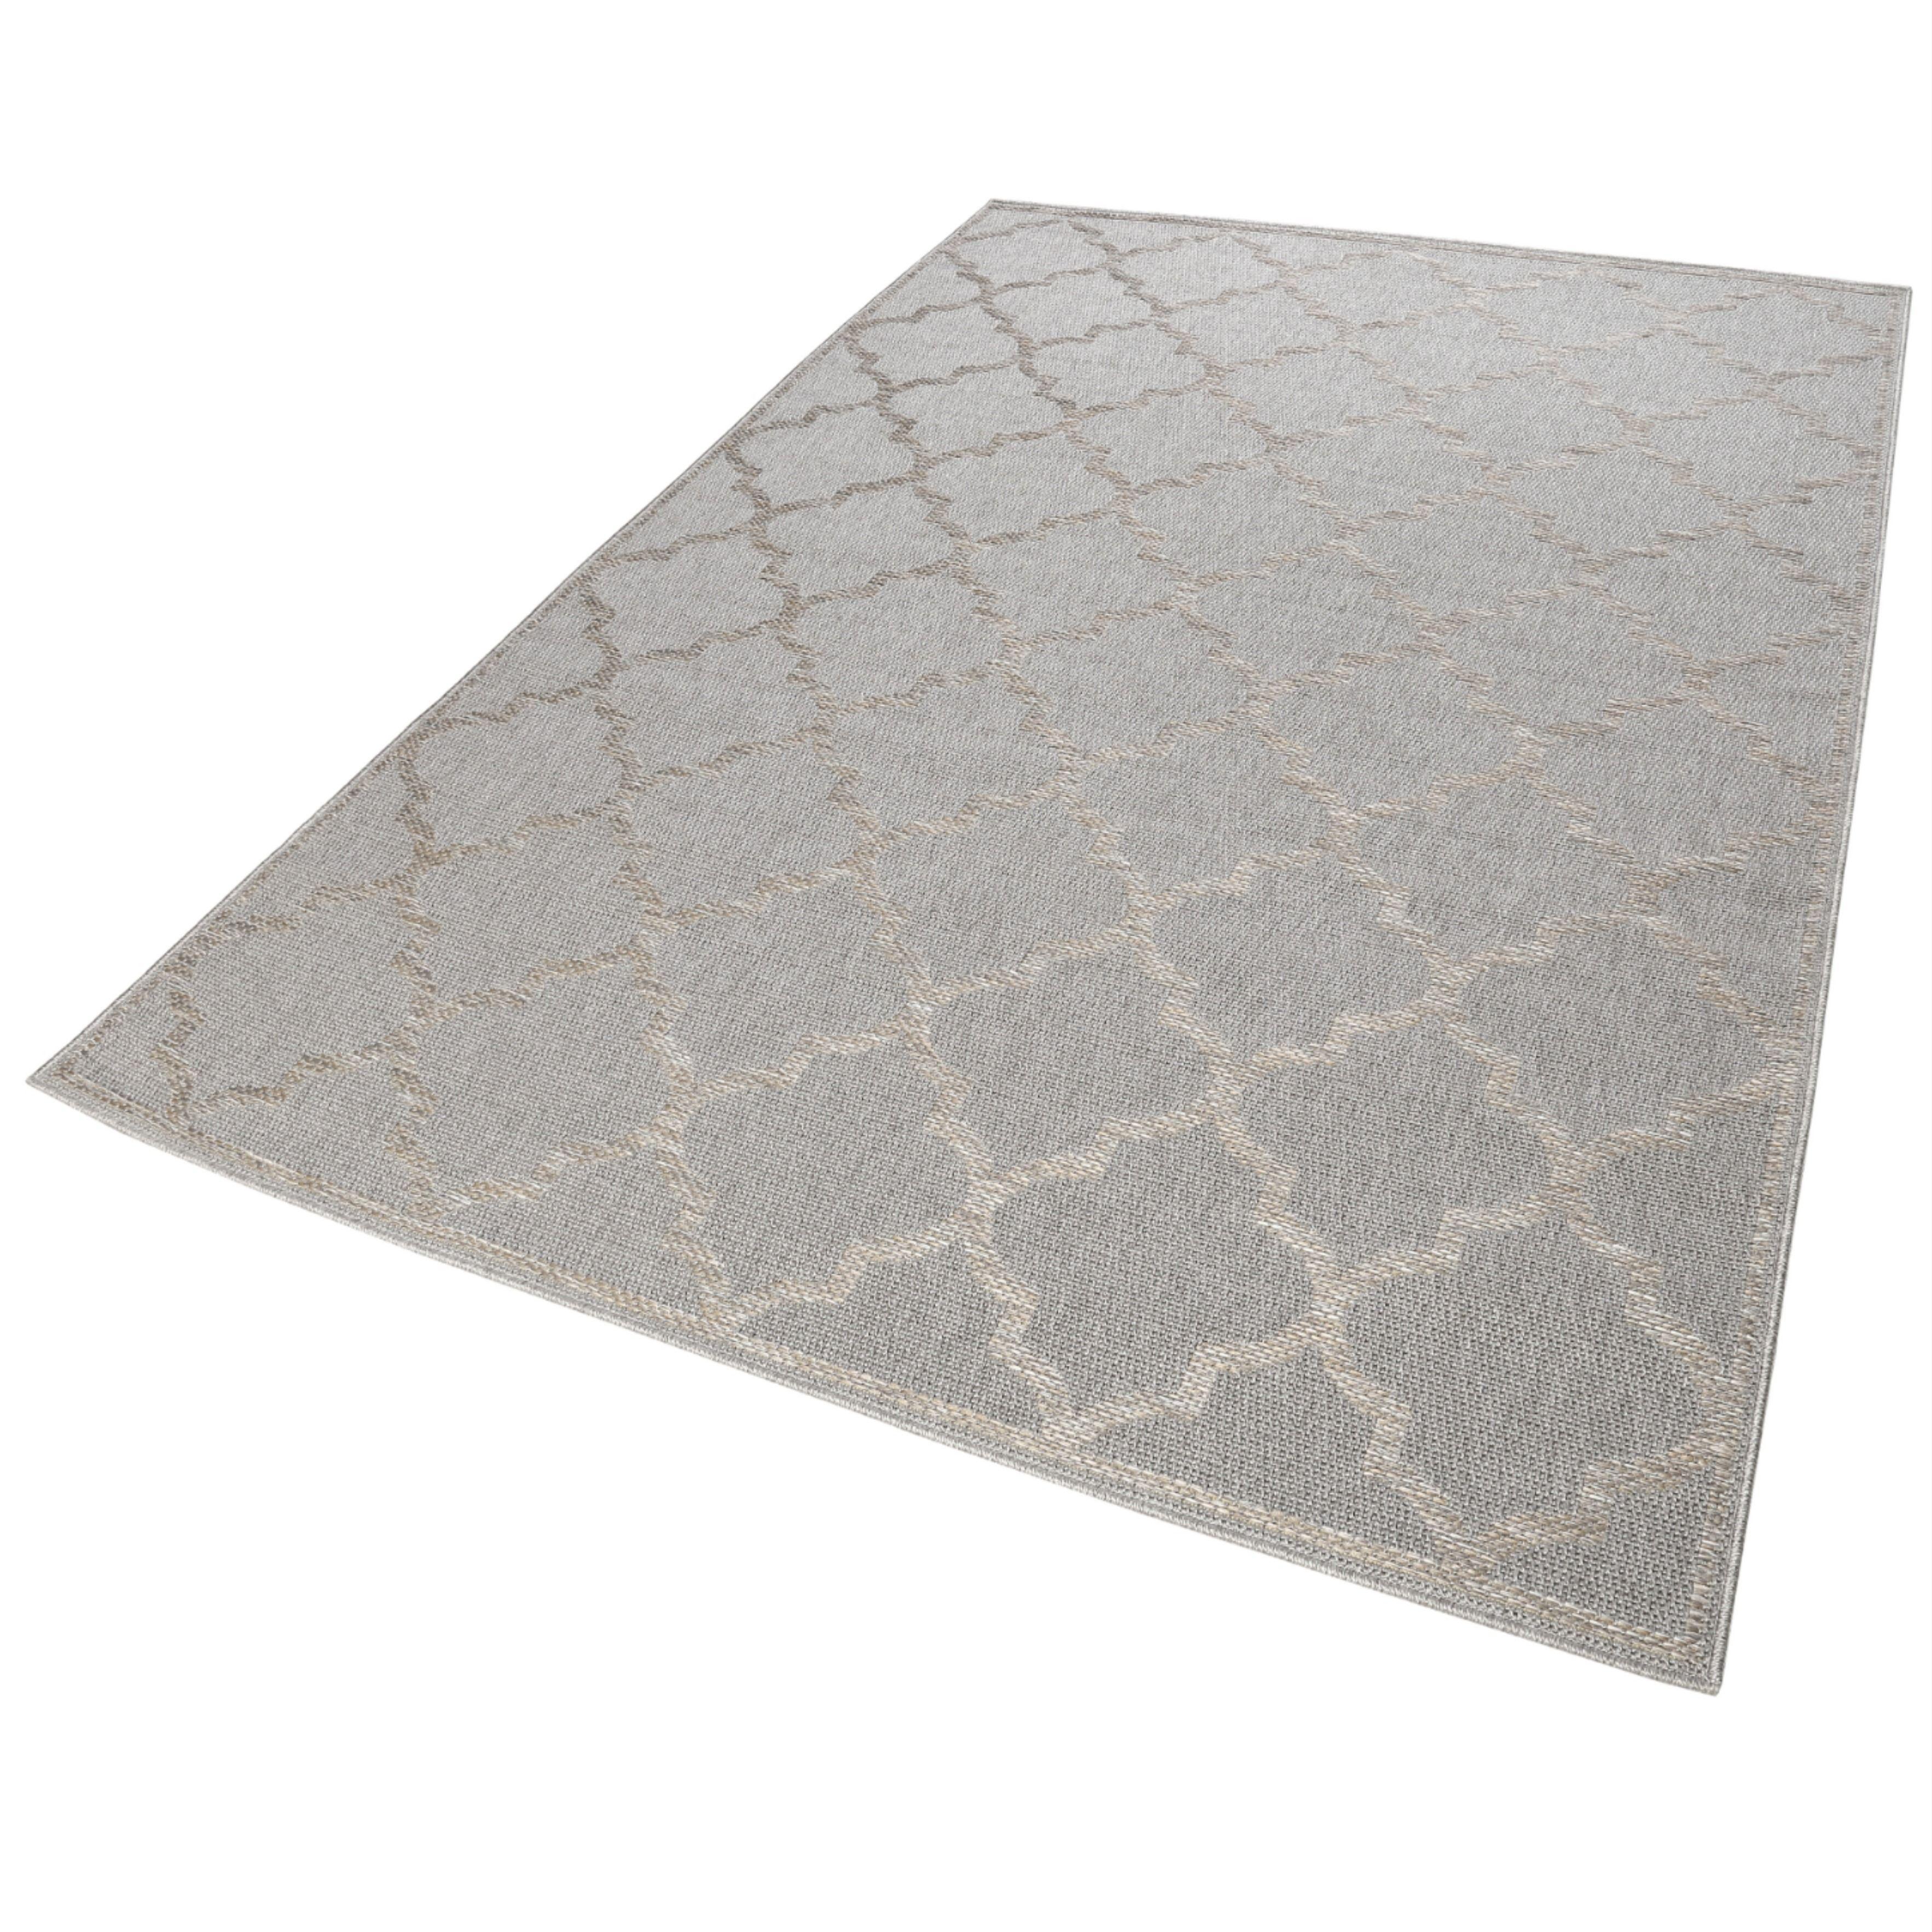 Outdoor Teppich Grau Silber » Gleamy « Wecon Home